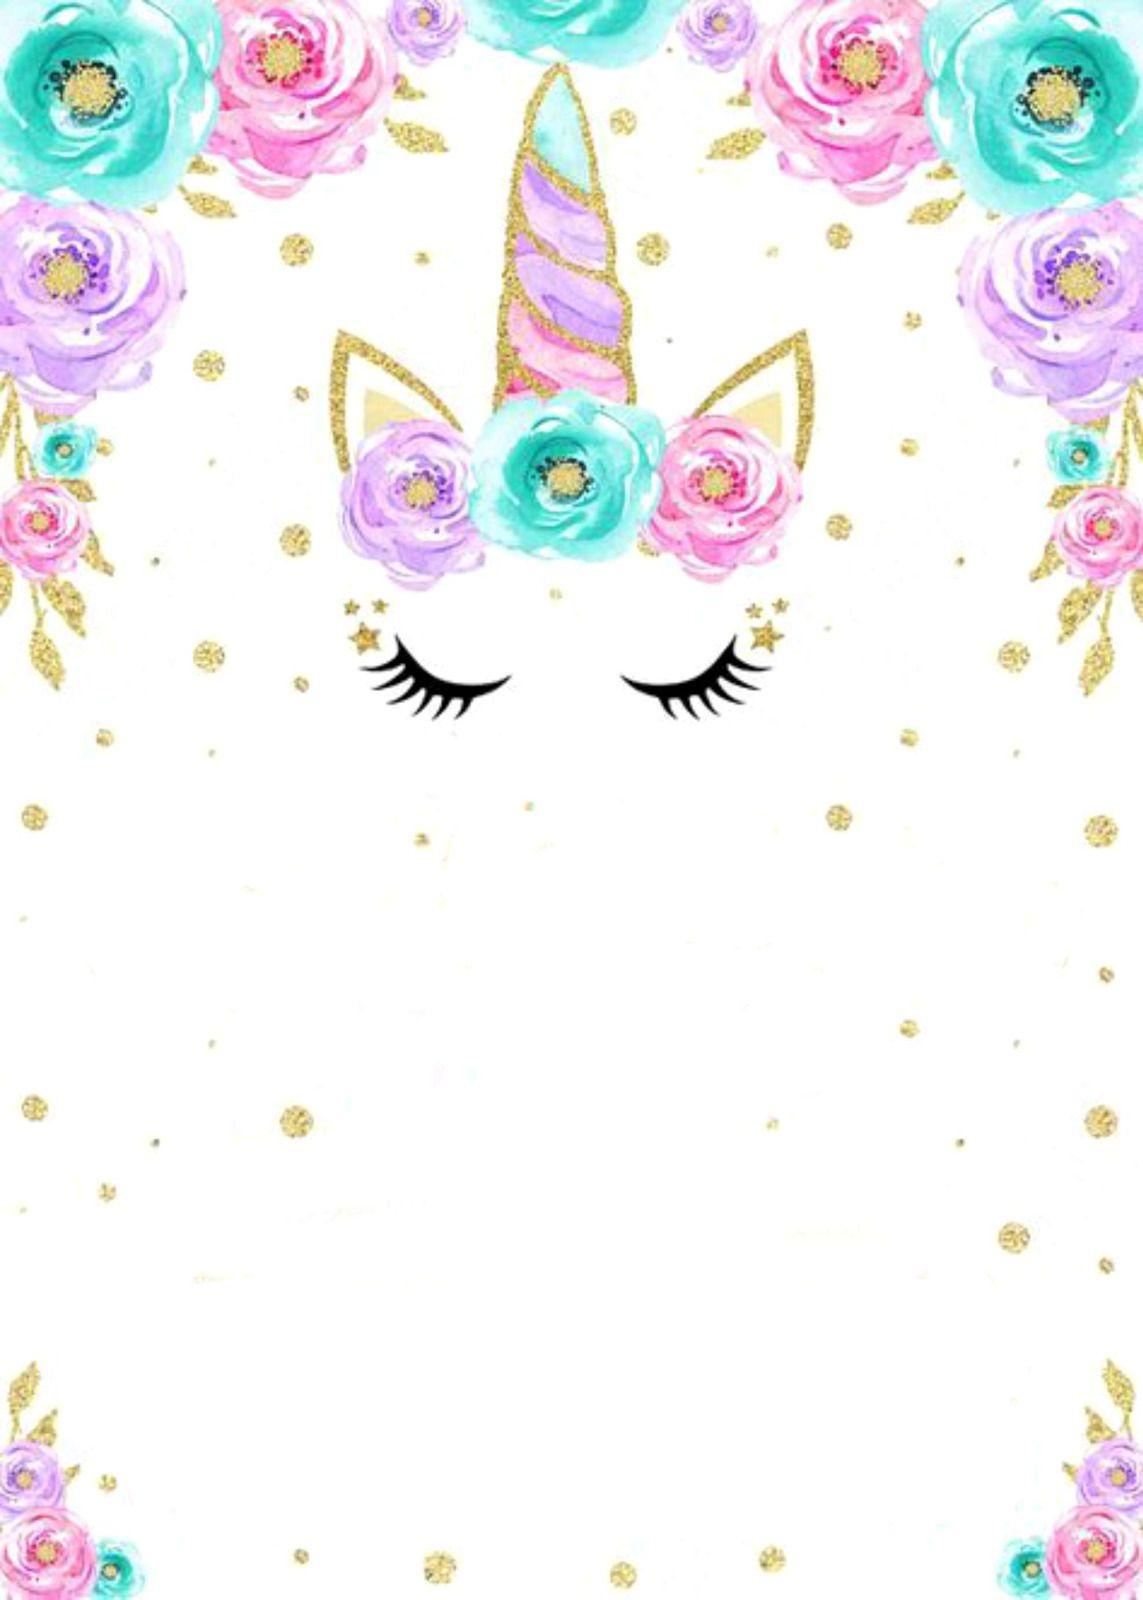 El Dorado Blue Card >> Pin de Claudia LL en bordes | Unicorn invitations, Unicorn birthday invitations y Unicorn ...